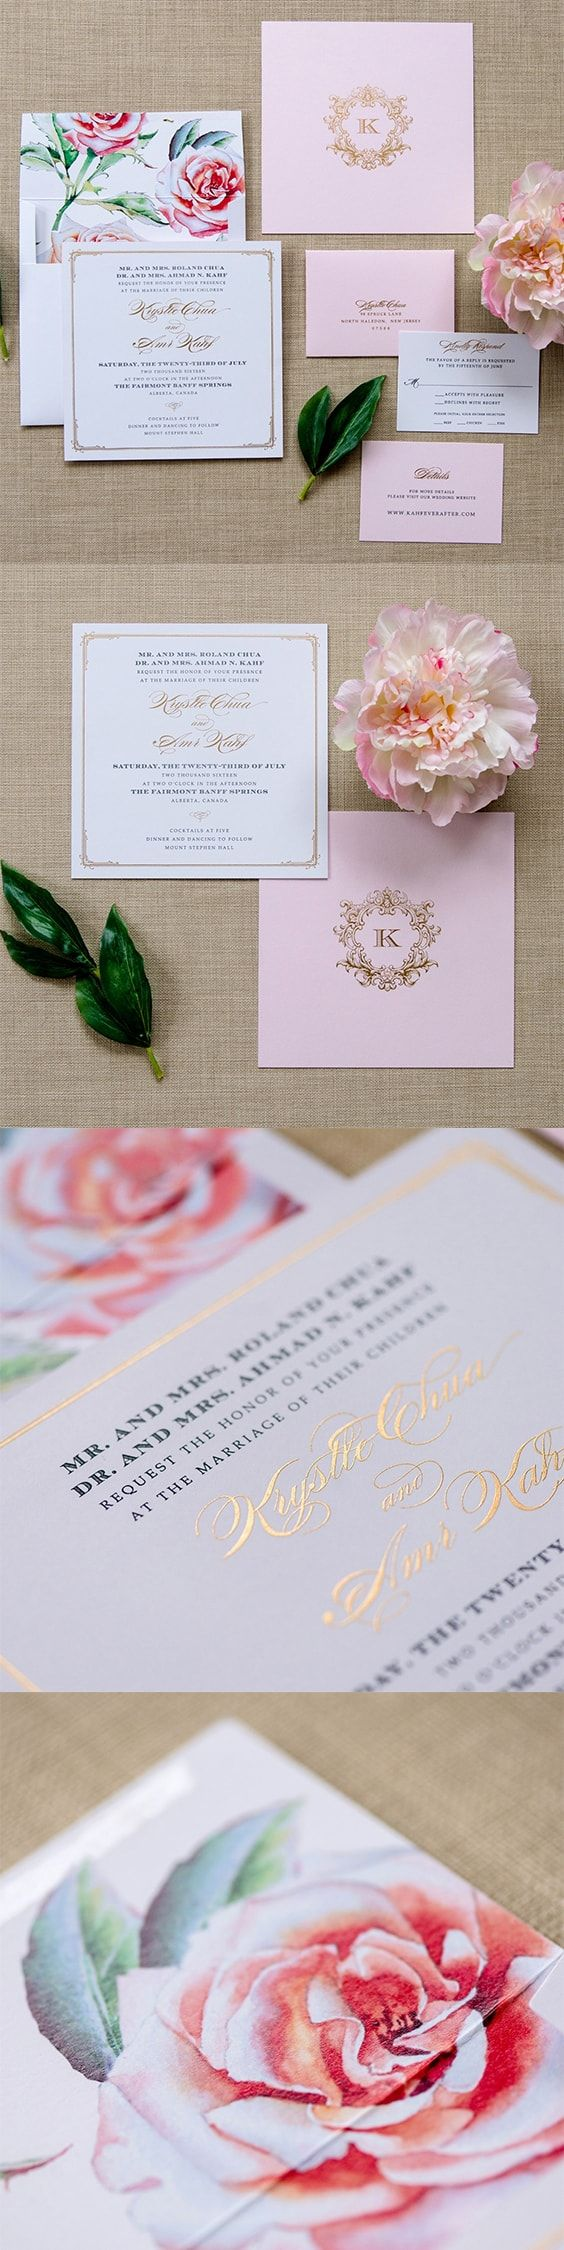 vintage country garden wedding invitations%0A Floral Wedding Invitation  Krystle Wedding Invitation